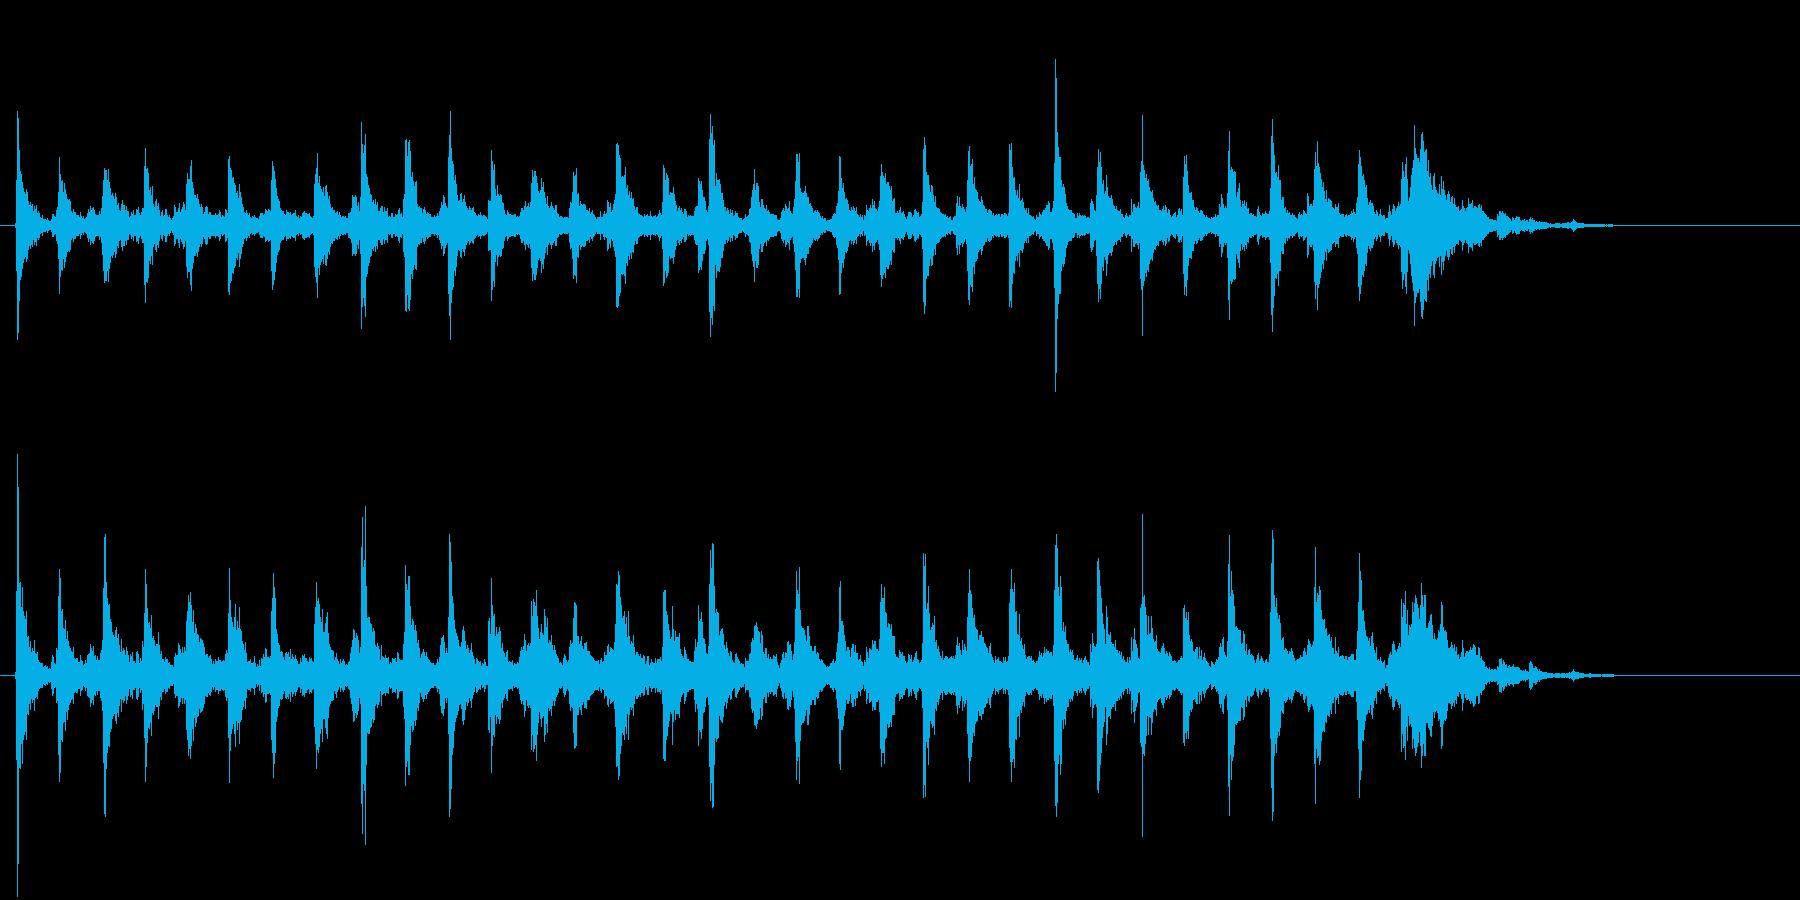 Xmasに最適トナカイベルのループ音07の再生済みの波形